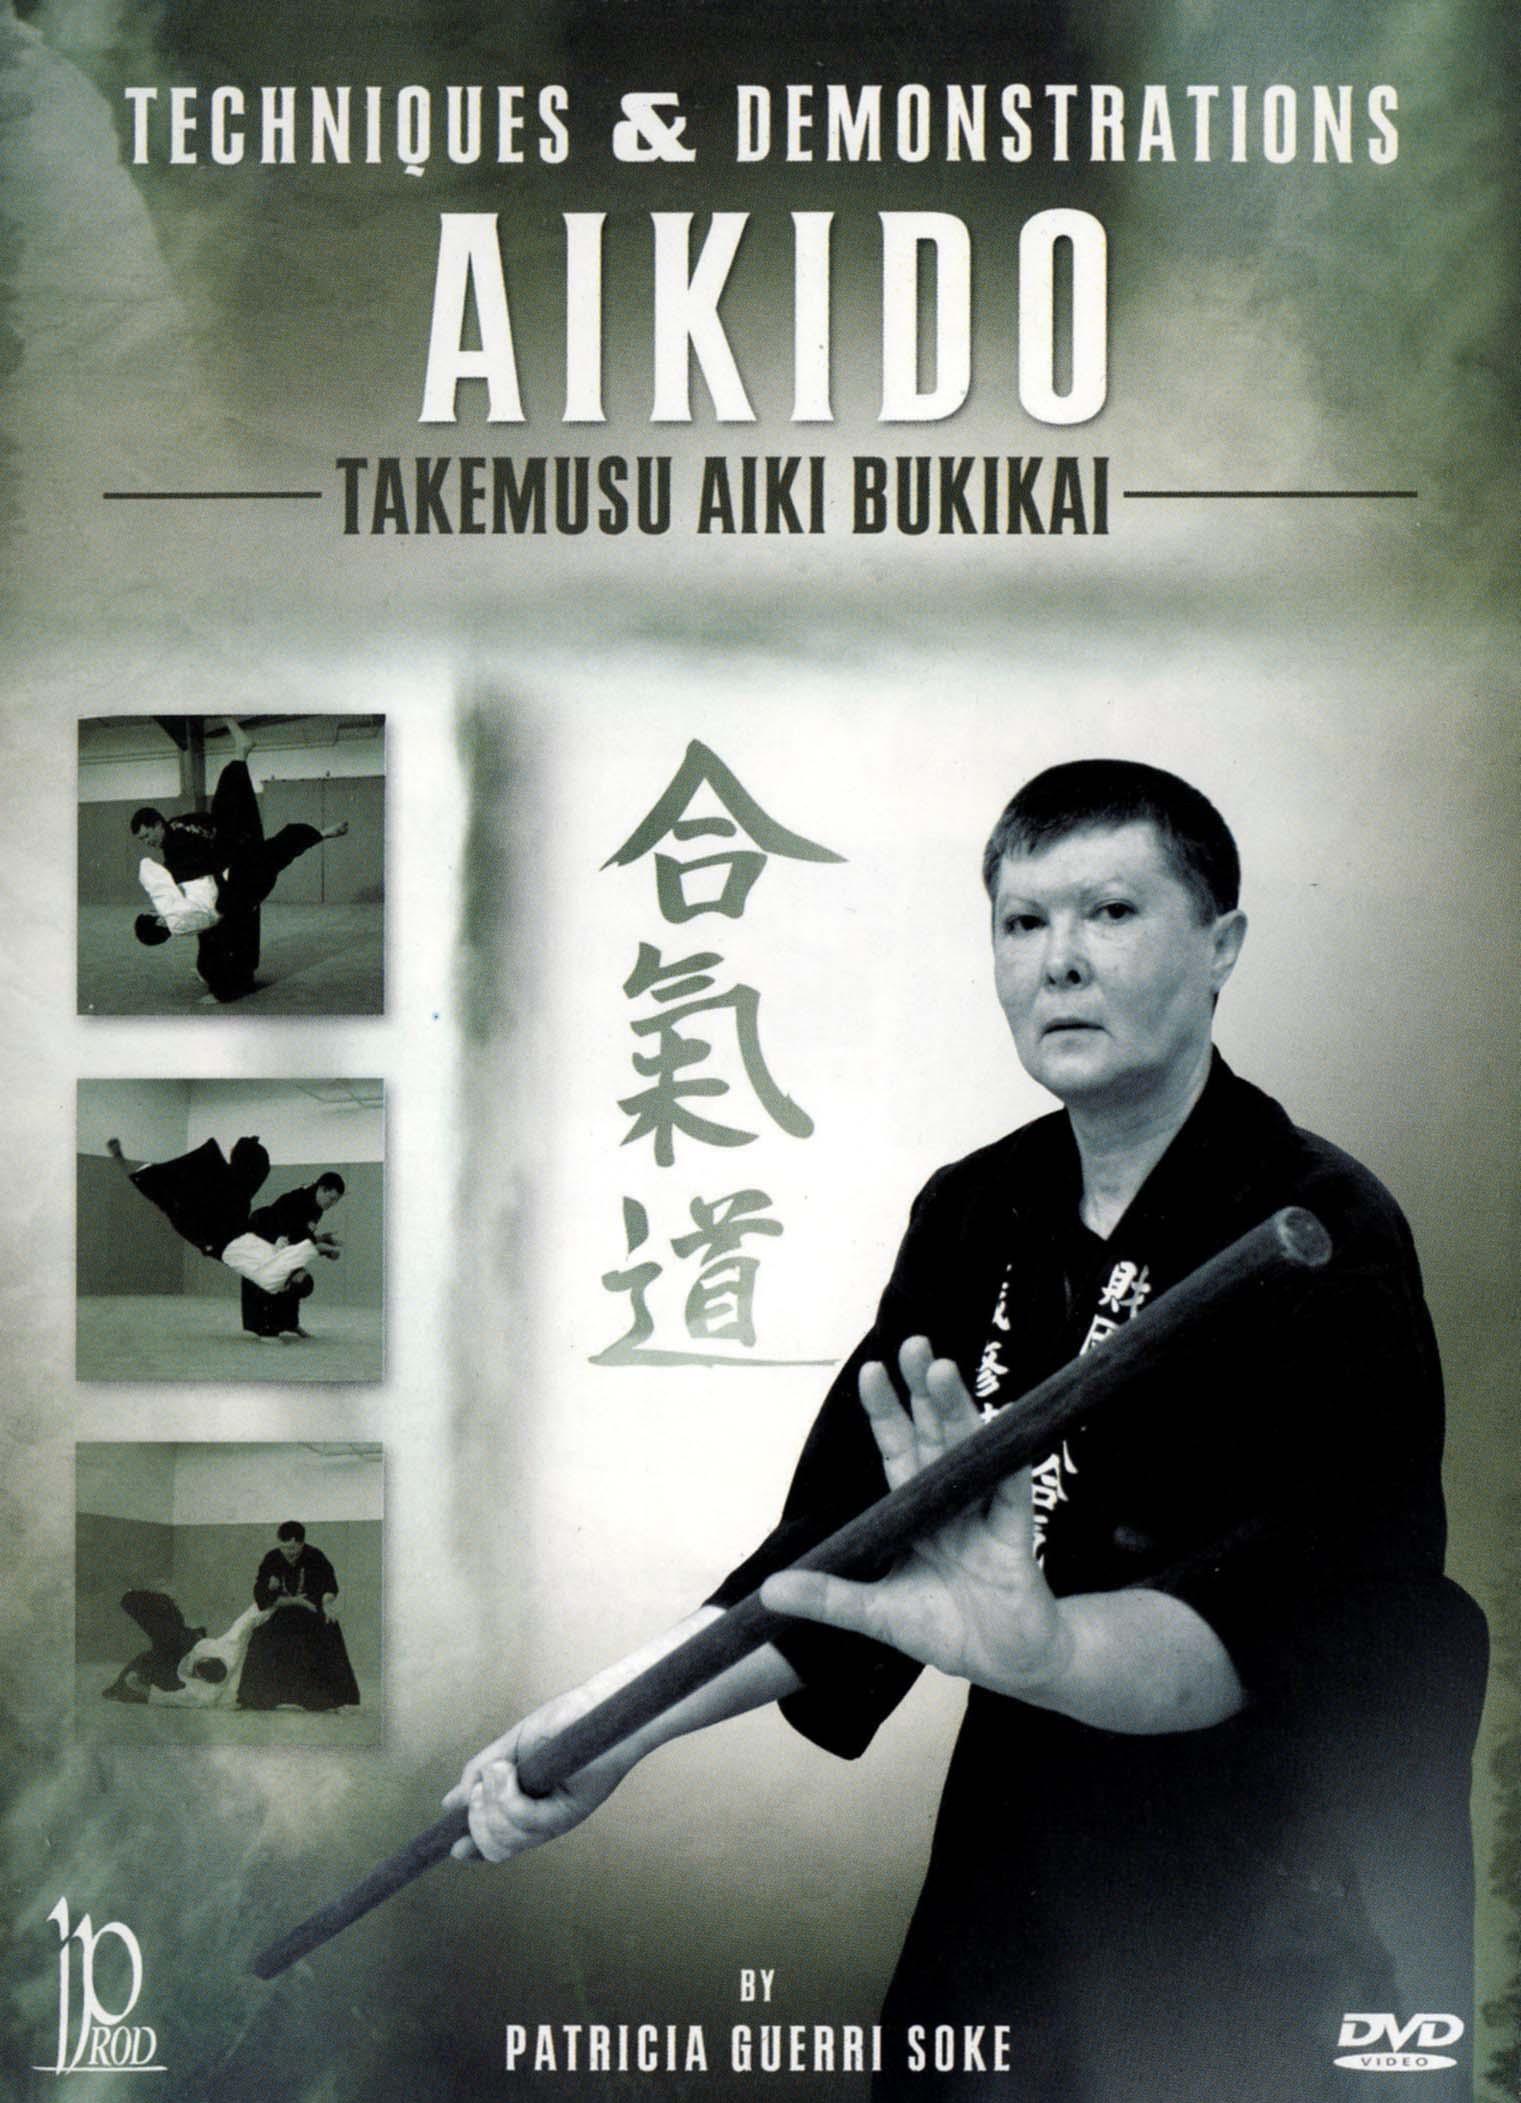 Aikido: Takemusu Aiki Bukikai